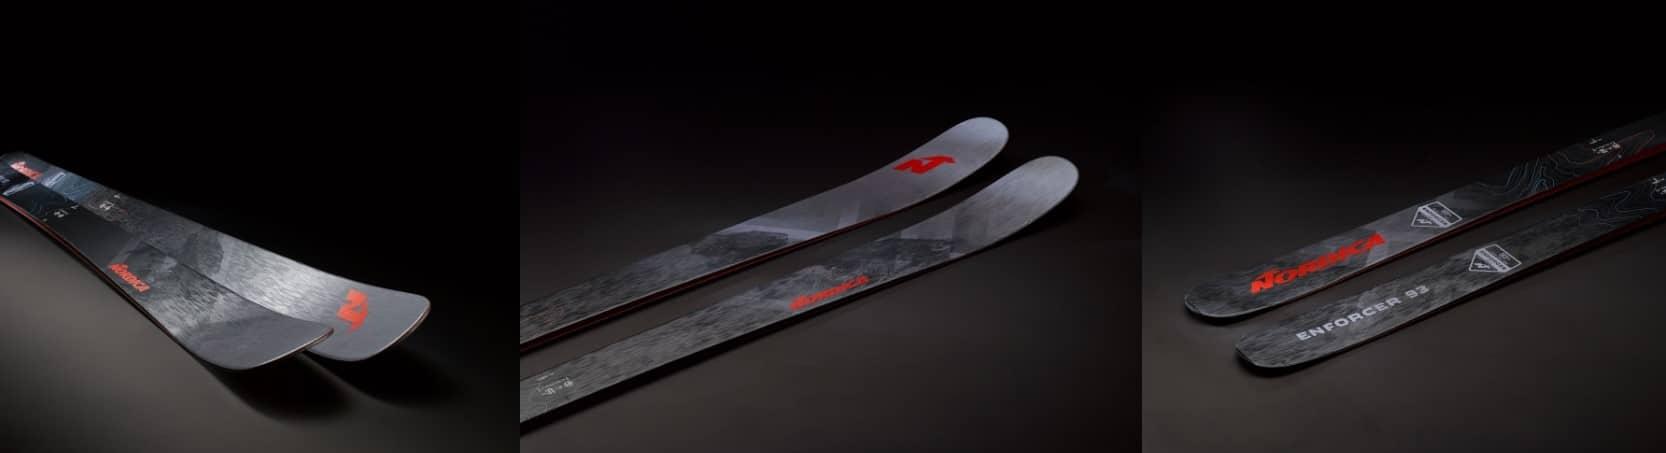 nordica enforcer skis performance